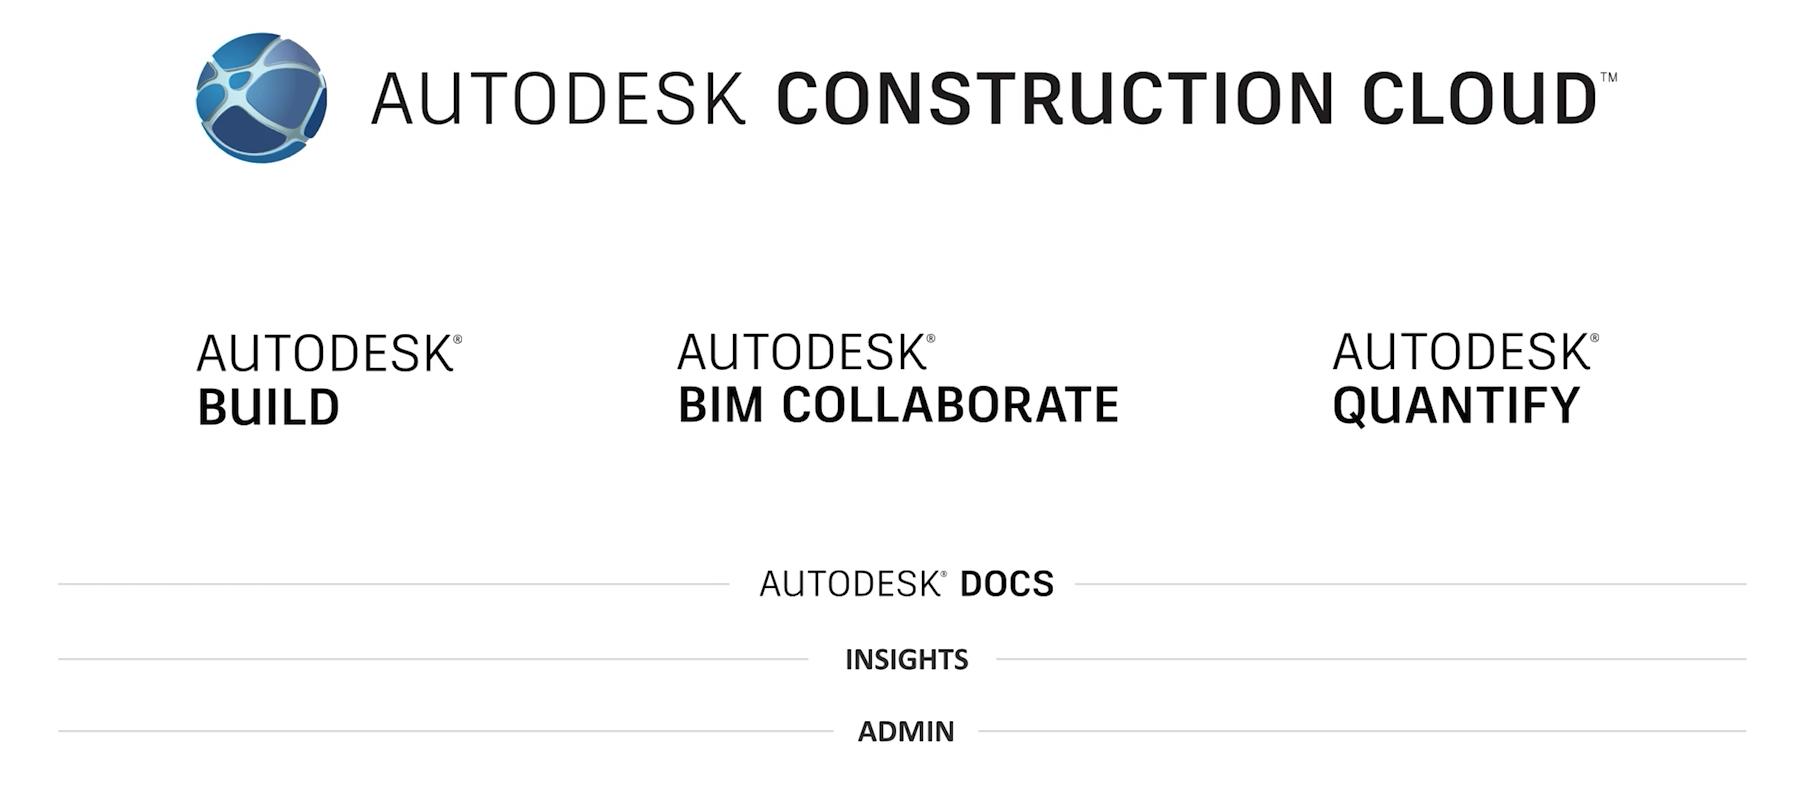 What's Next with Autodesk Construction Cloud